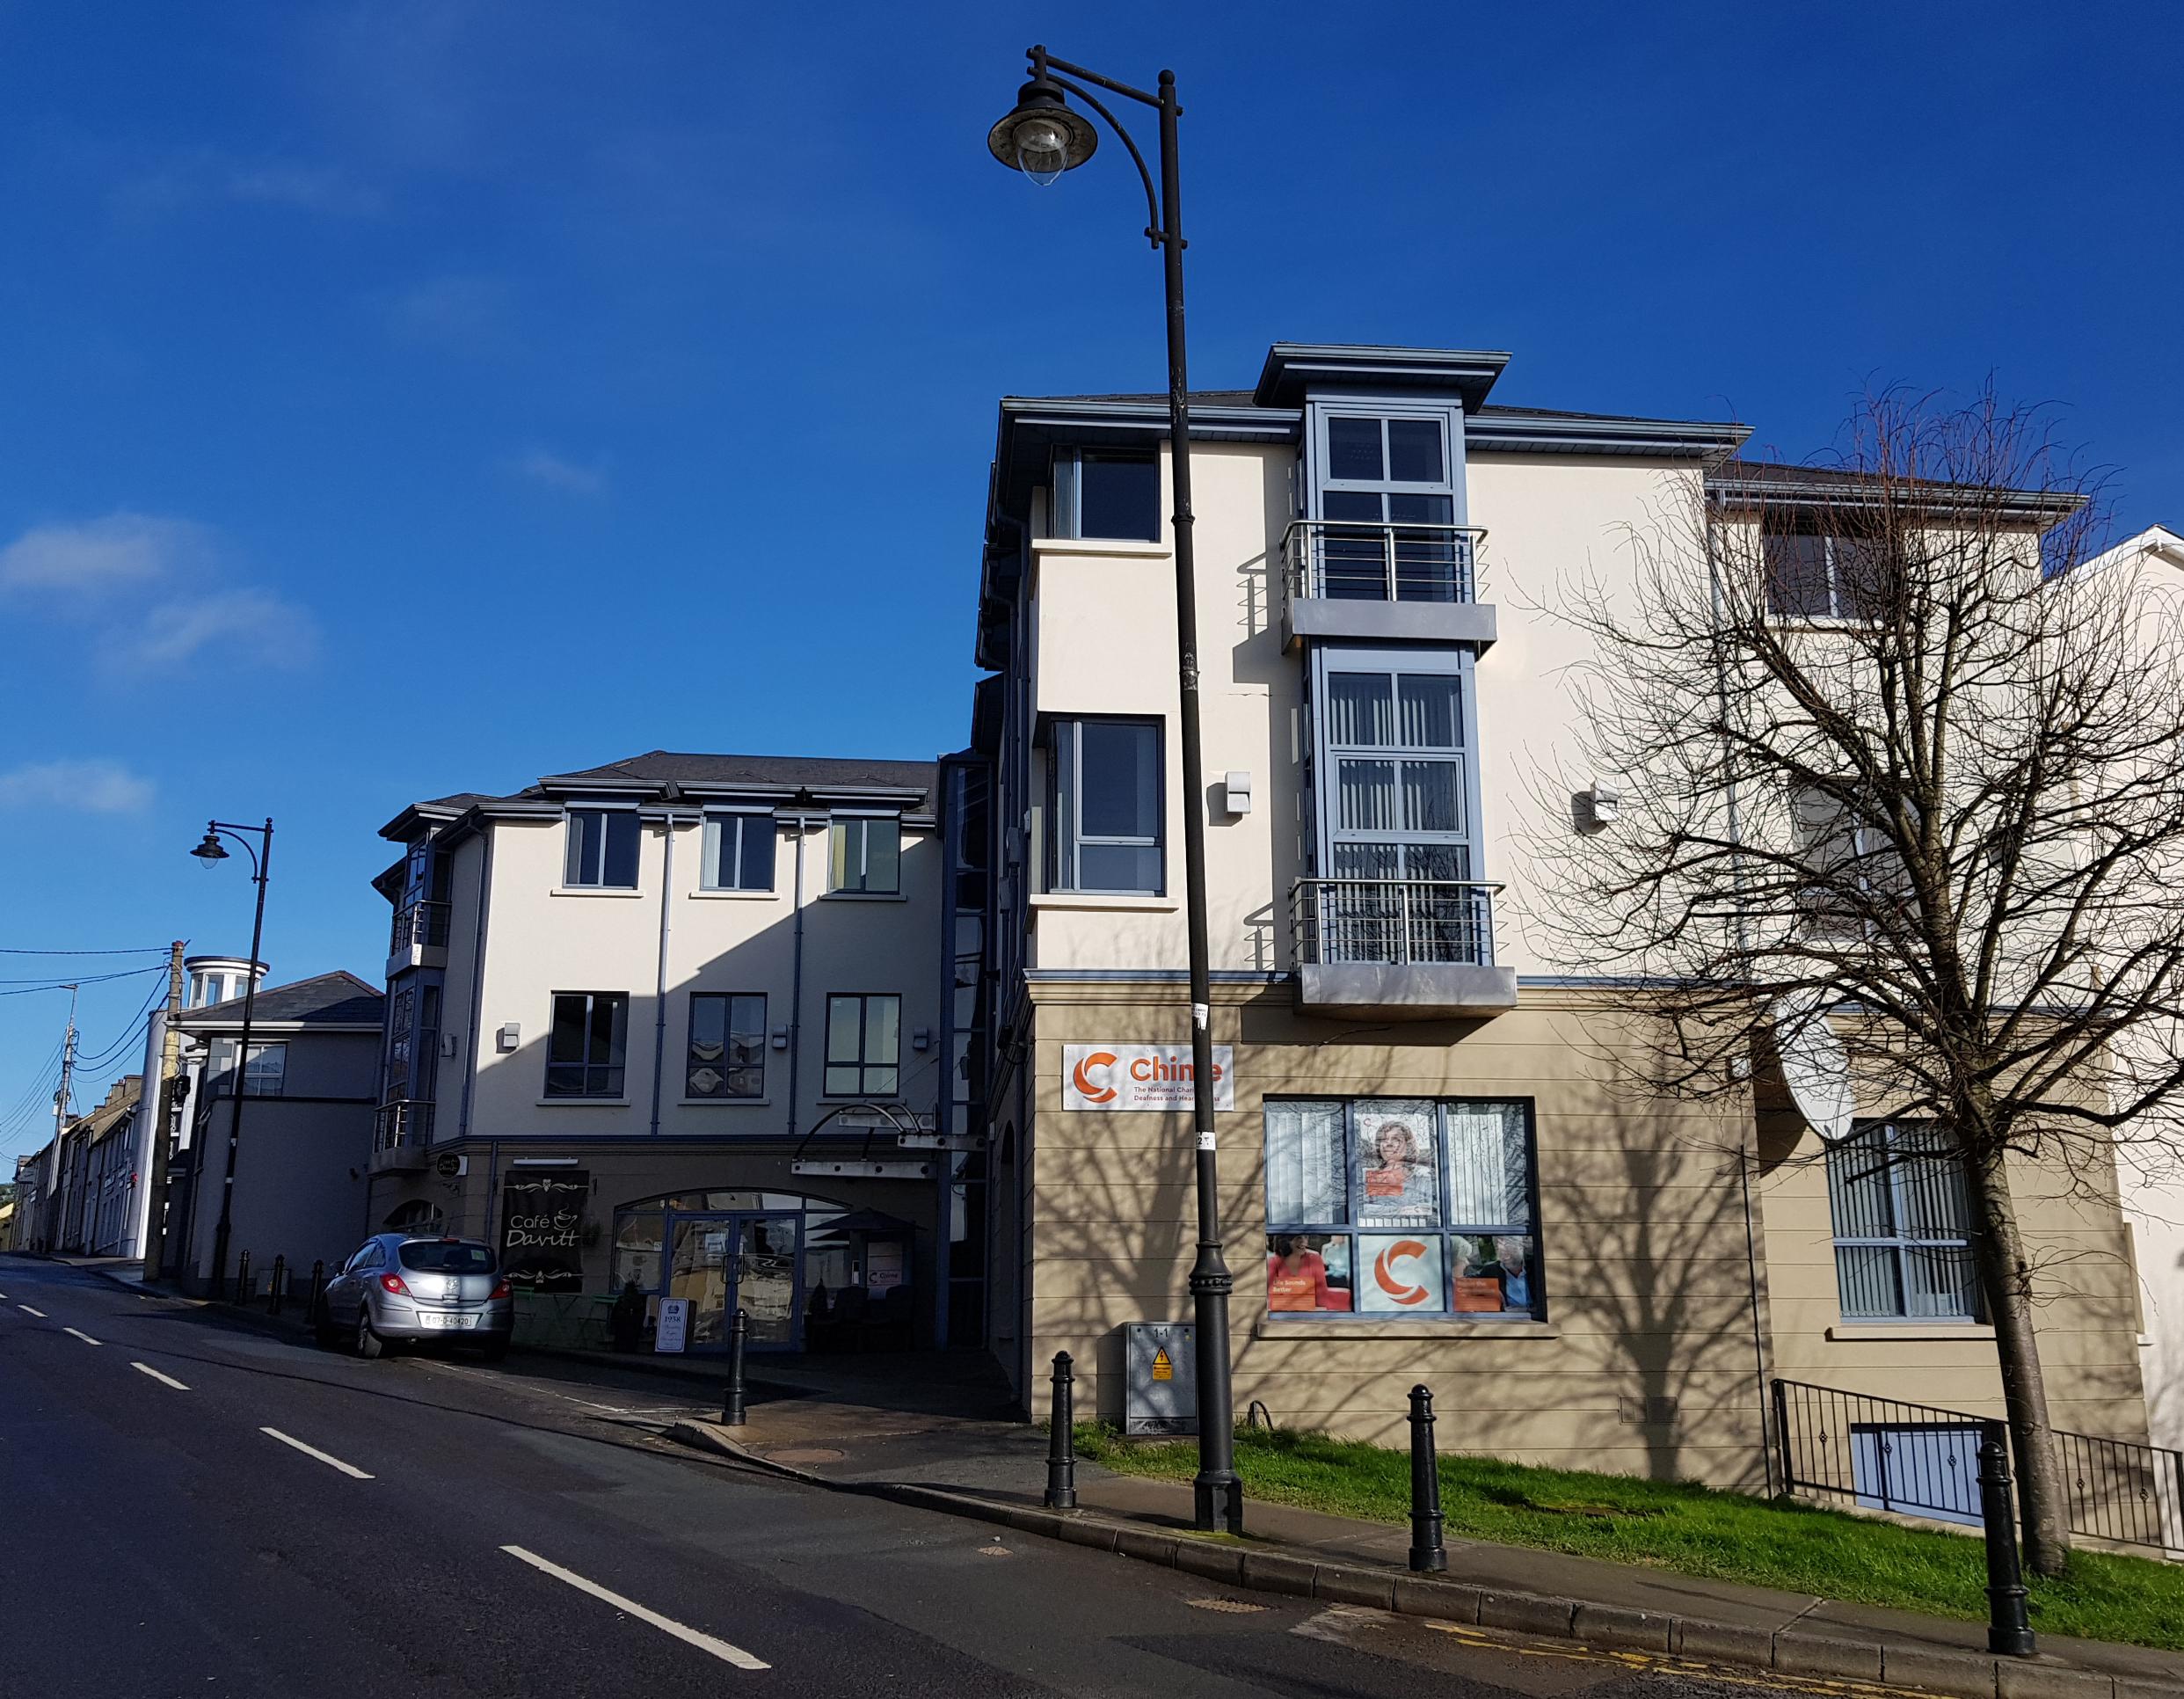 Spencer House, High Road, Letterkenny, Co. Donegal, F92 V8XC